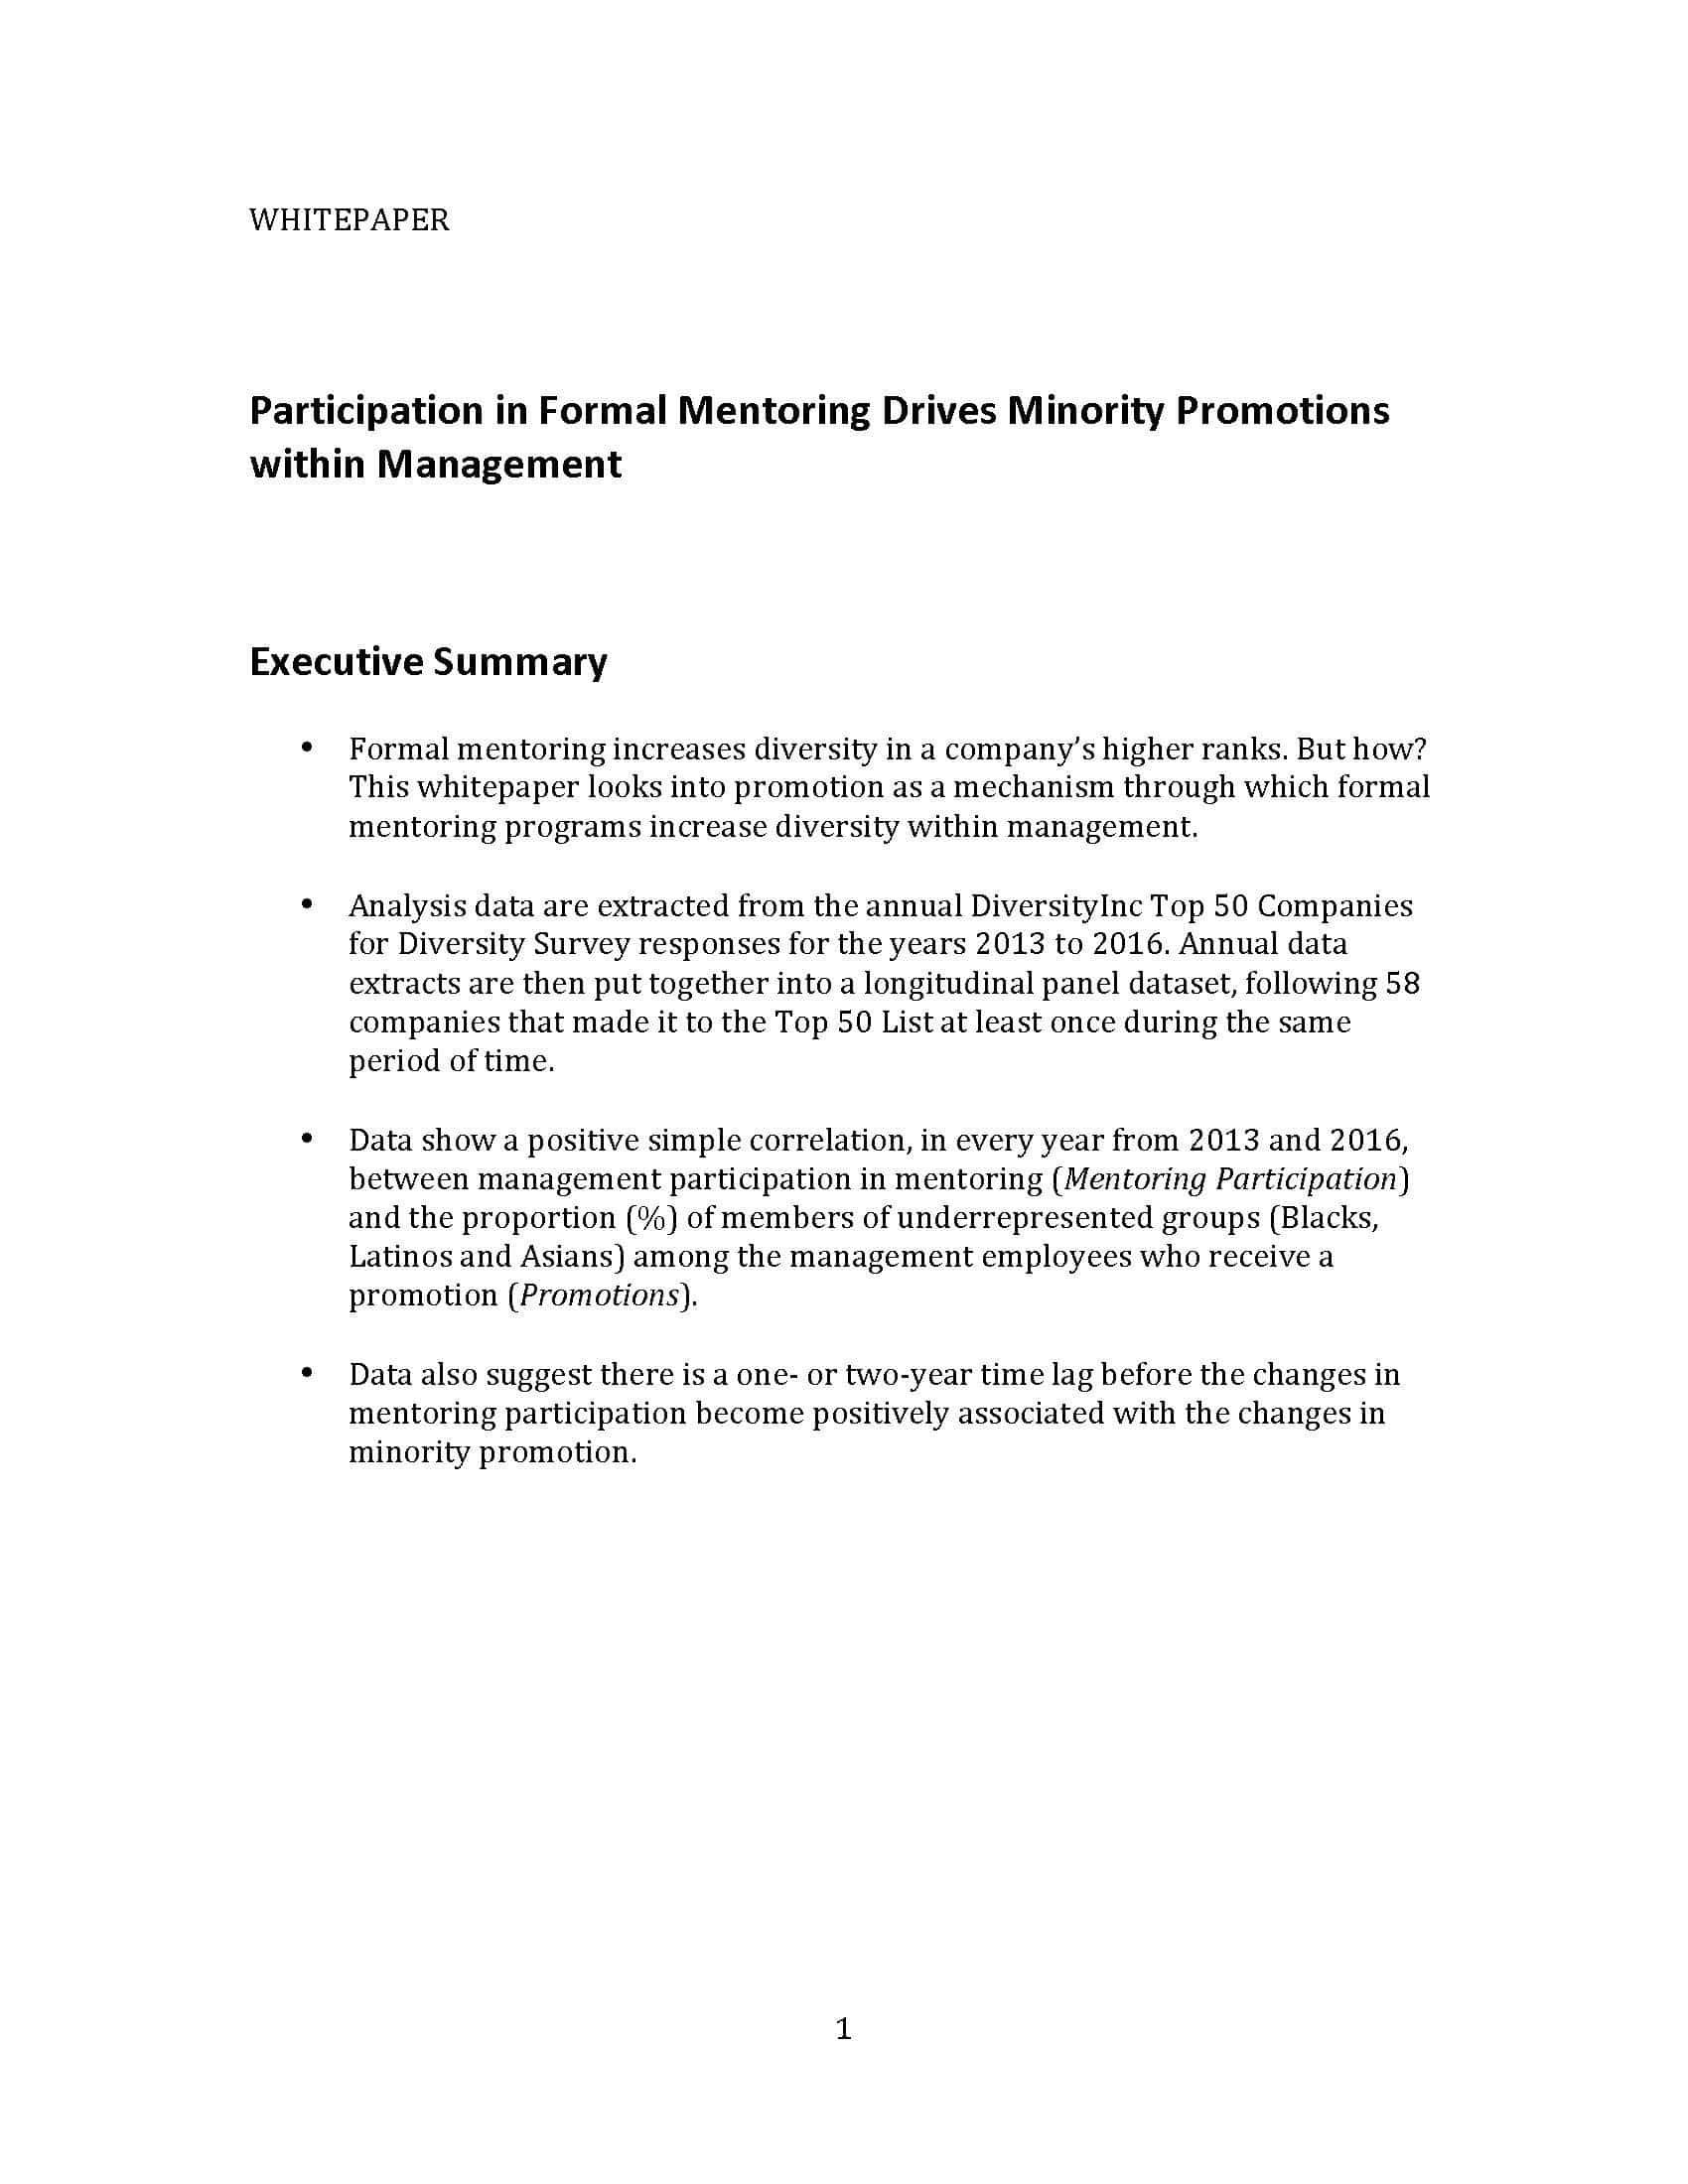 whitepapermentoringandpromotions20161220jpeg_page_1